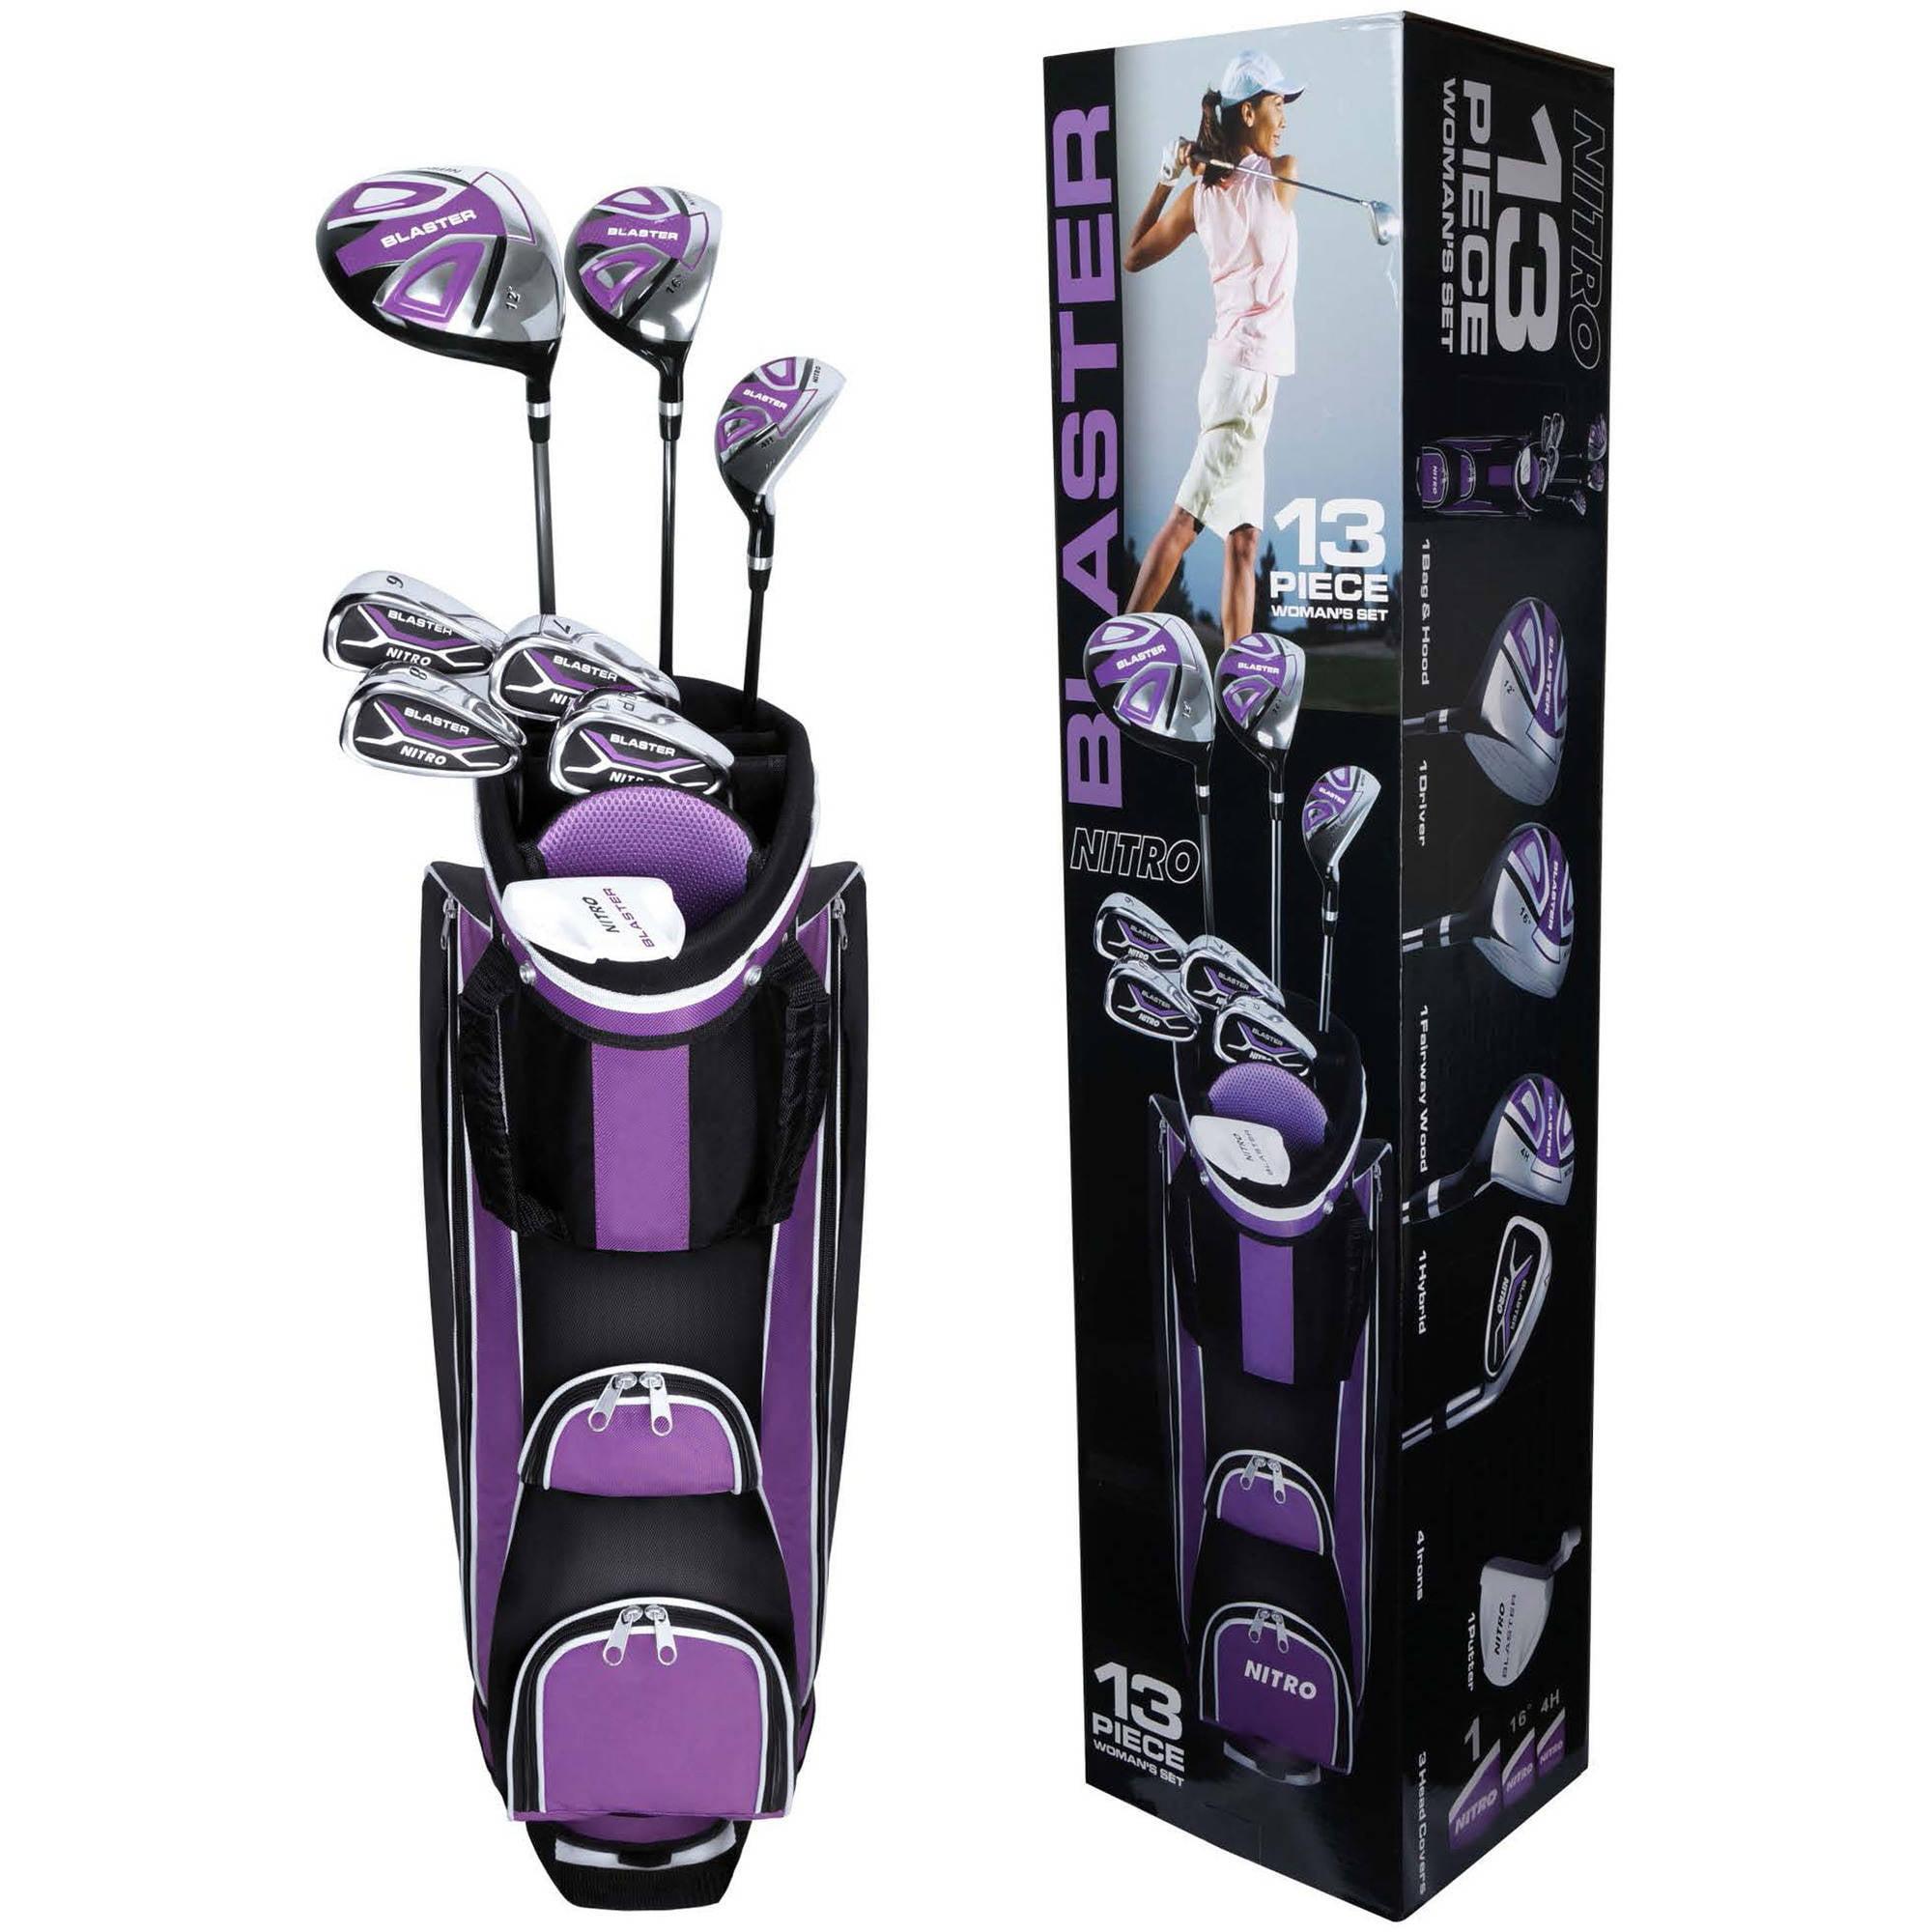 Nitro Golf Set, Ladies, 13-Piece by Nitro